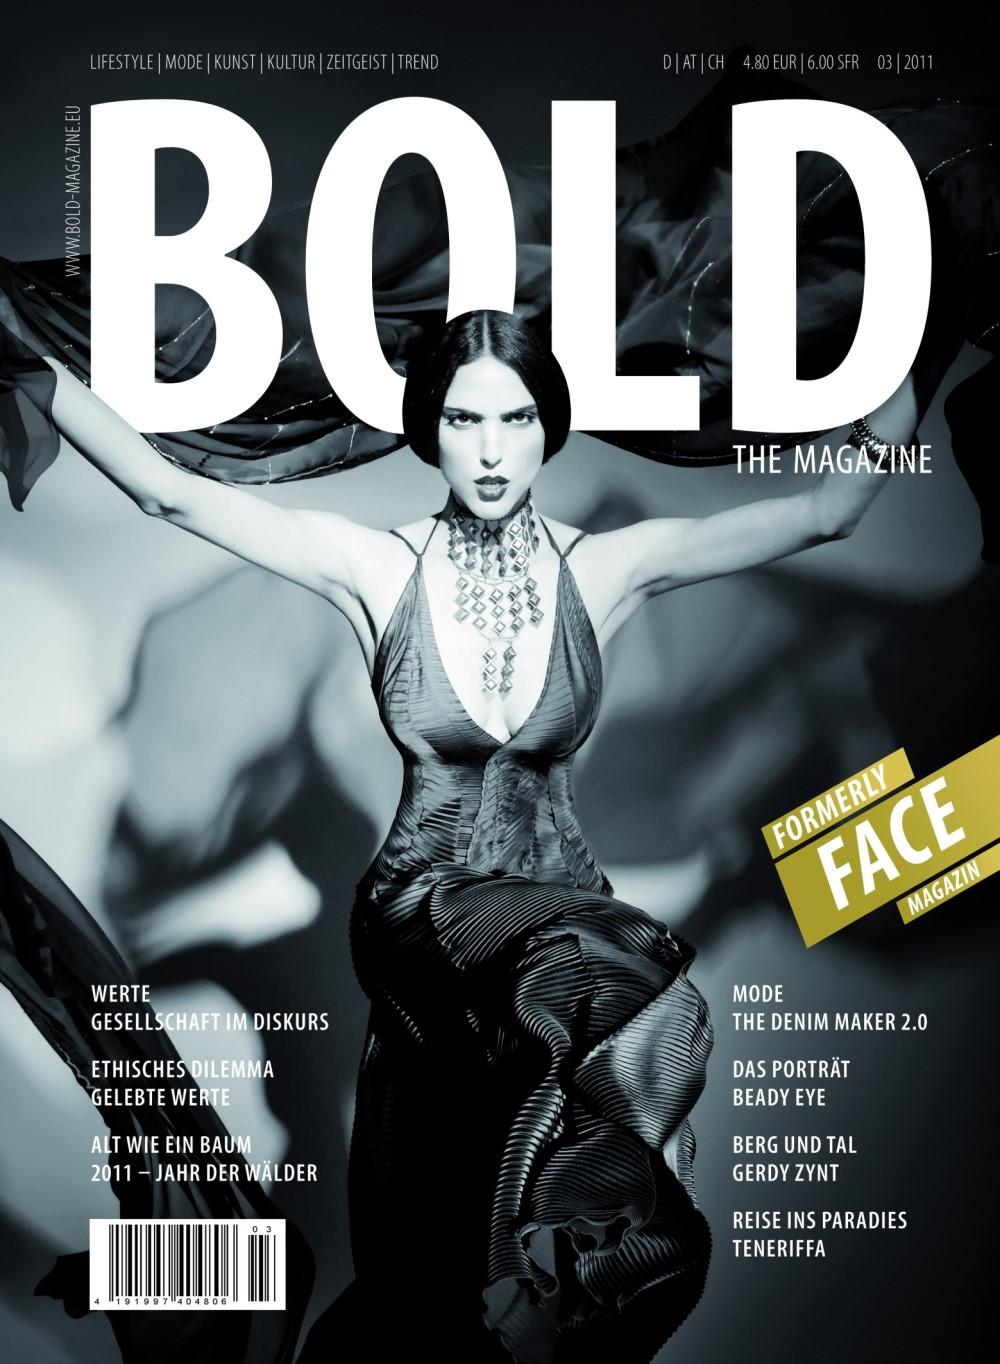 magazine aus face wird bold. Black Bedroom Furniture Sets. Home Design Ideas